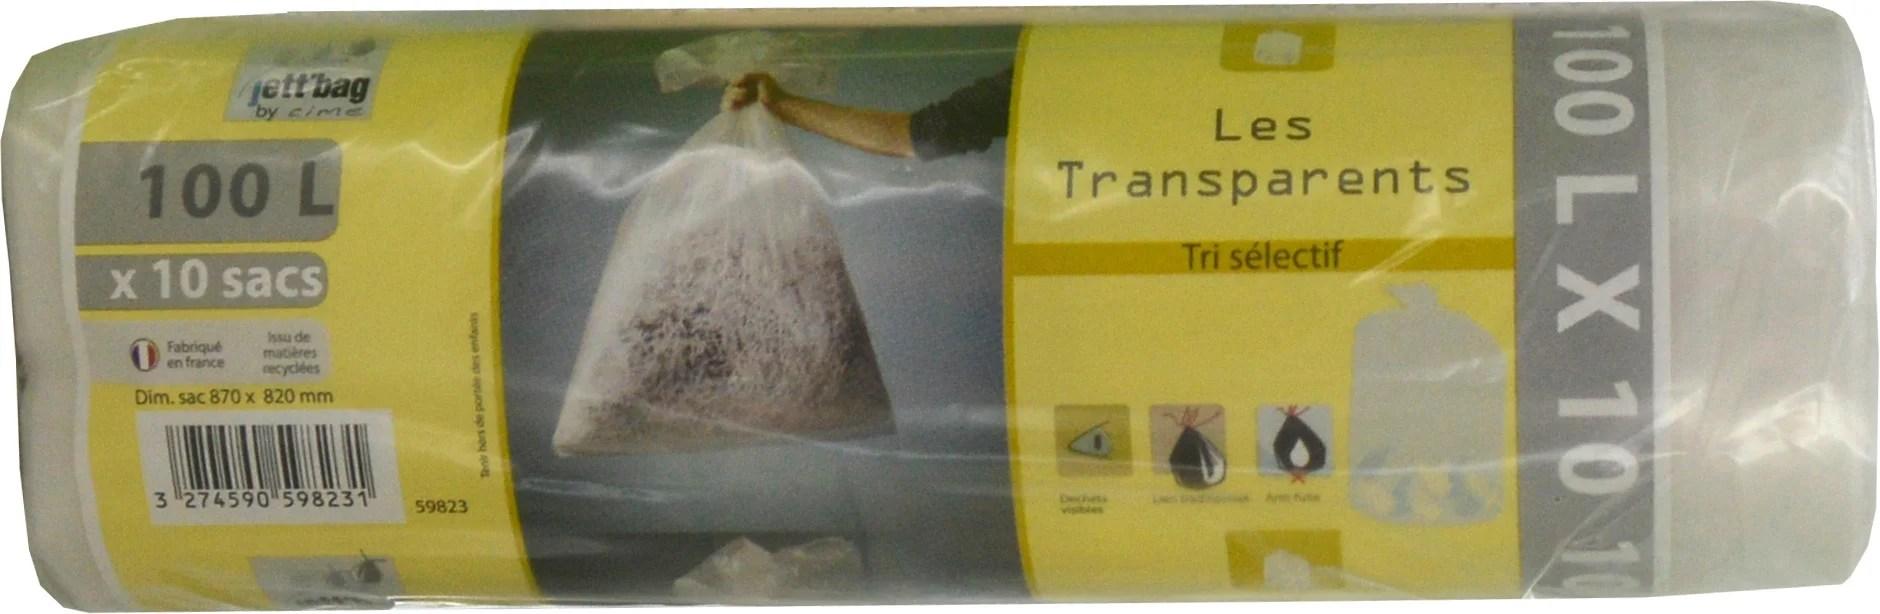 Sac A Dechet Transparent 100 L Leroy Merlin